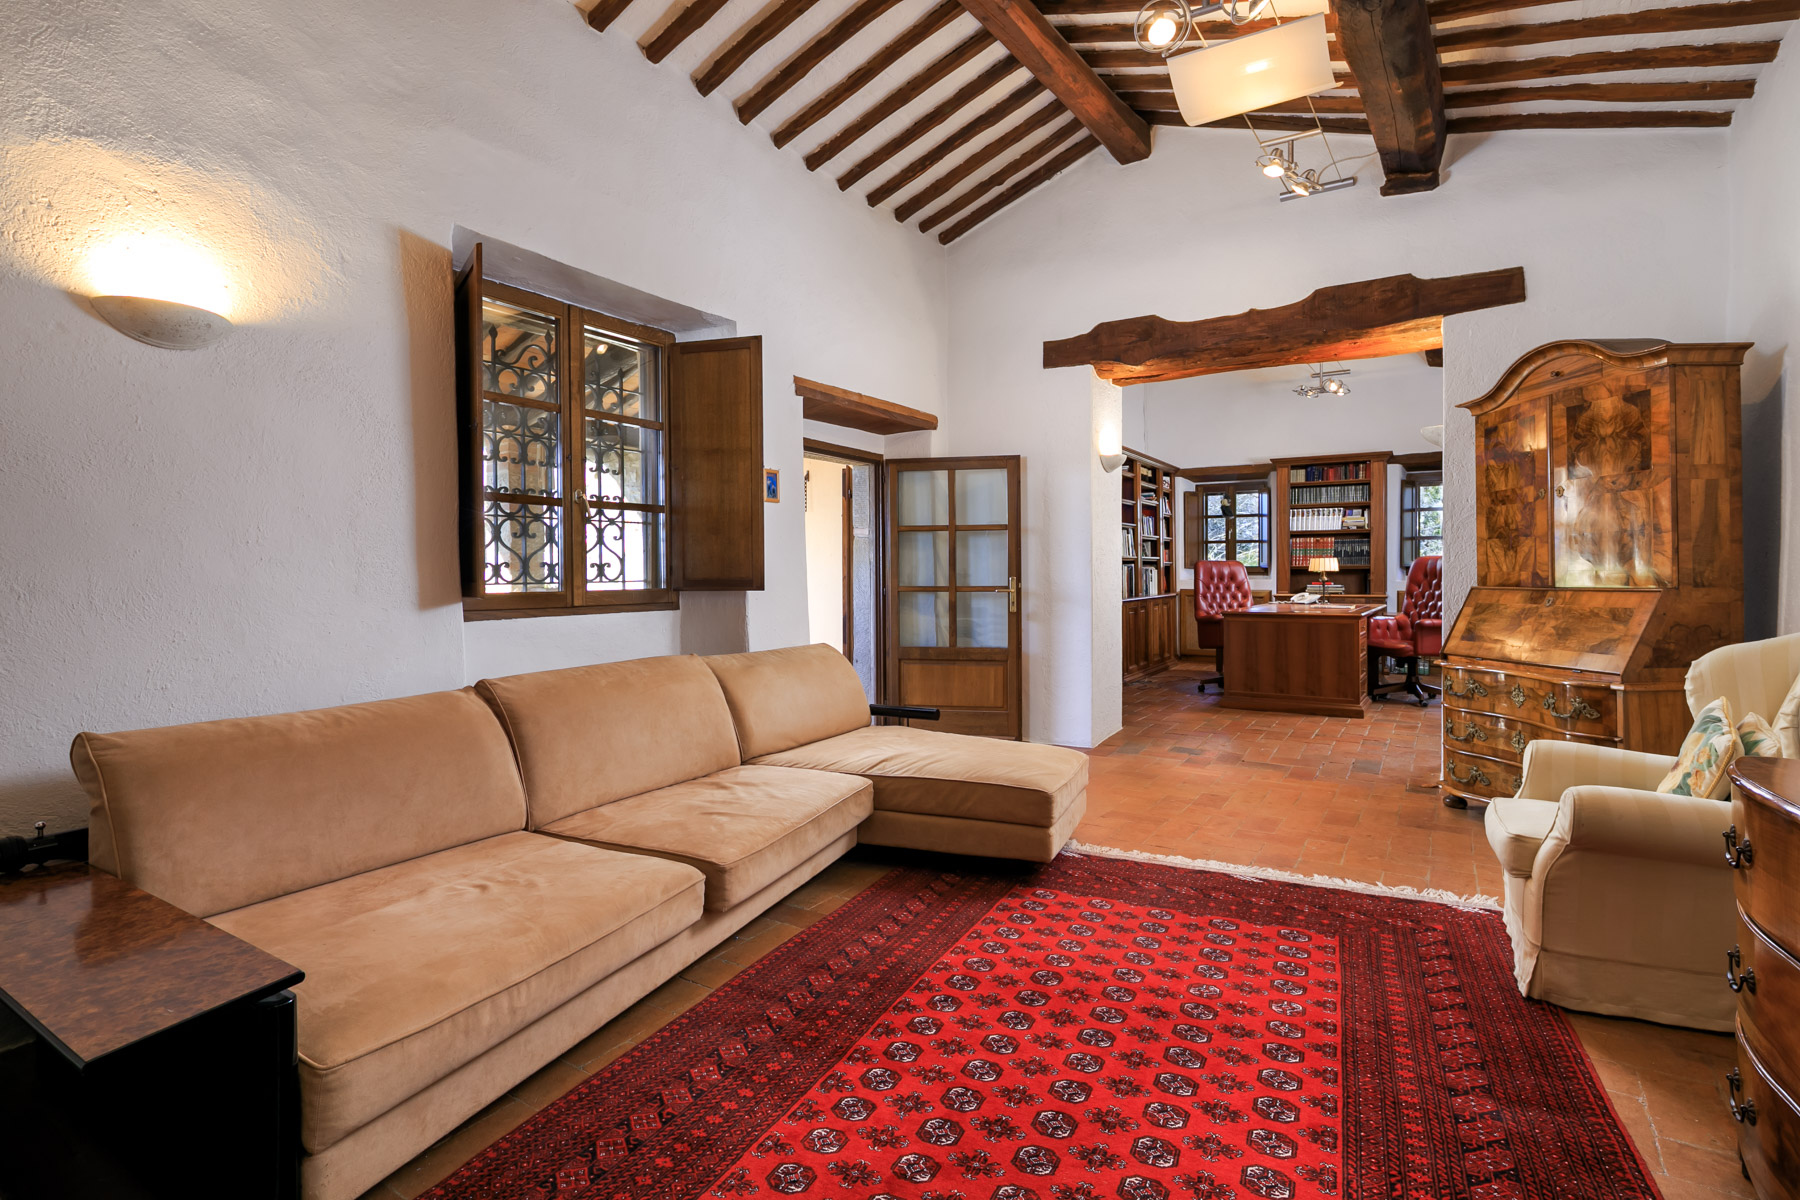 Villa in Vendita a Gaiole In Chianti: 5 locali, 465 mq - Foto 23